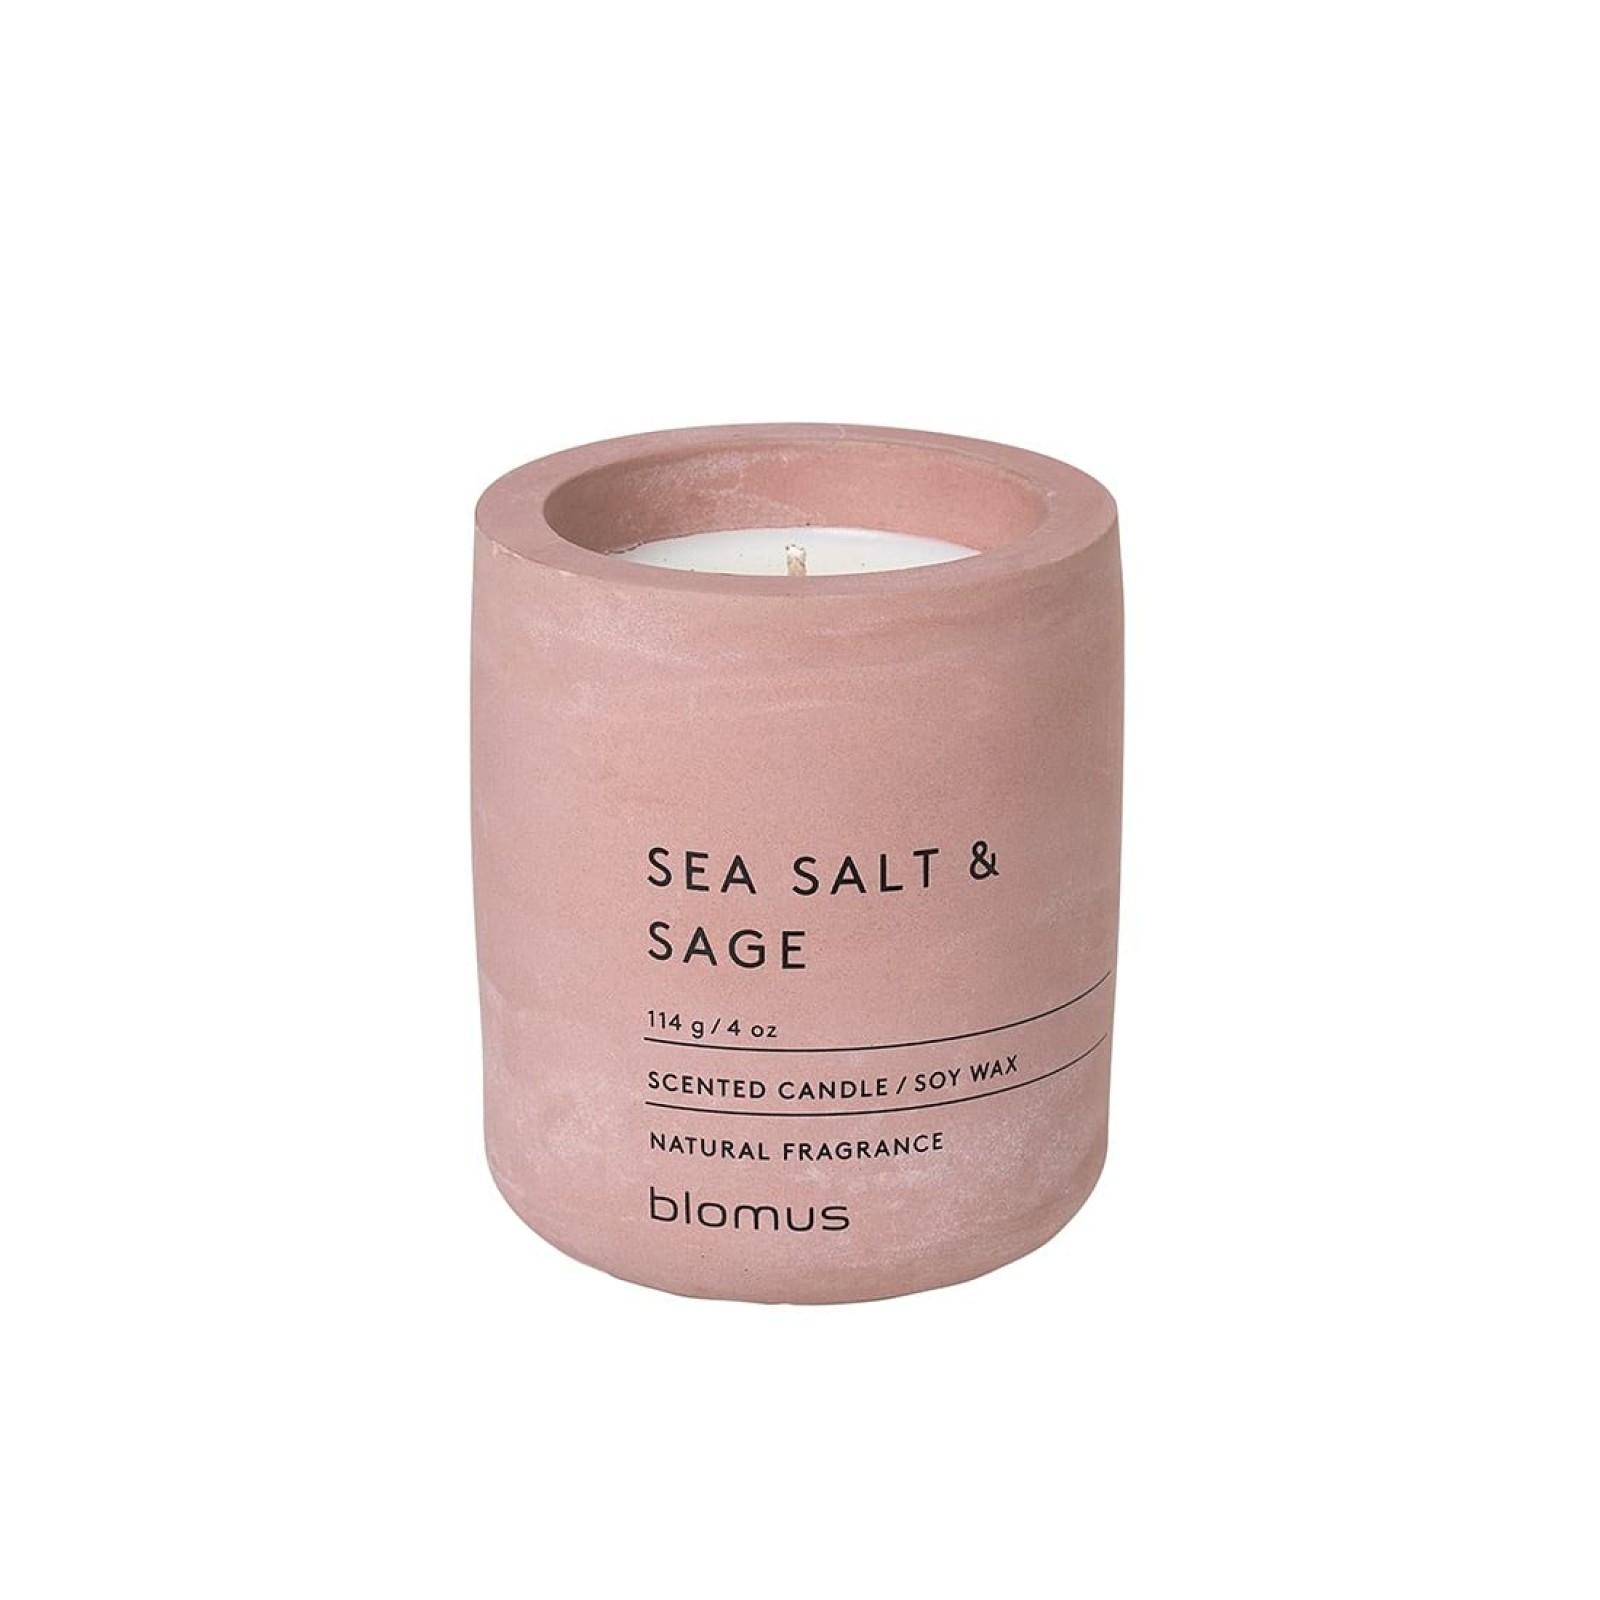 Scented Candle FRAGA S Sea Salt & Sage - Blomus